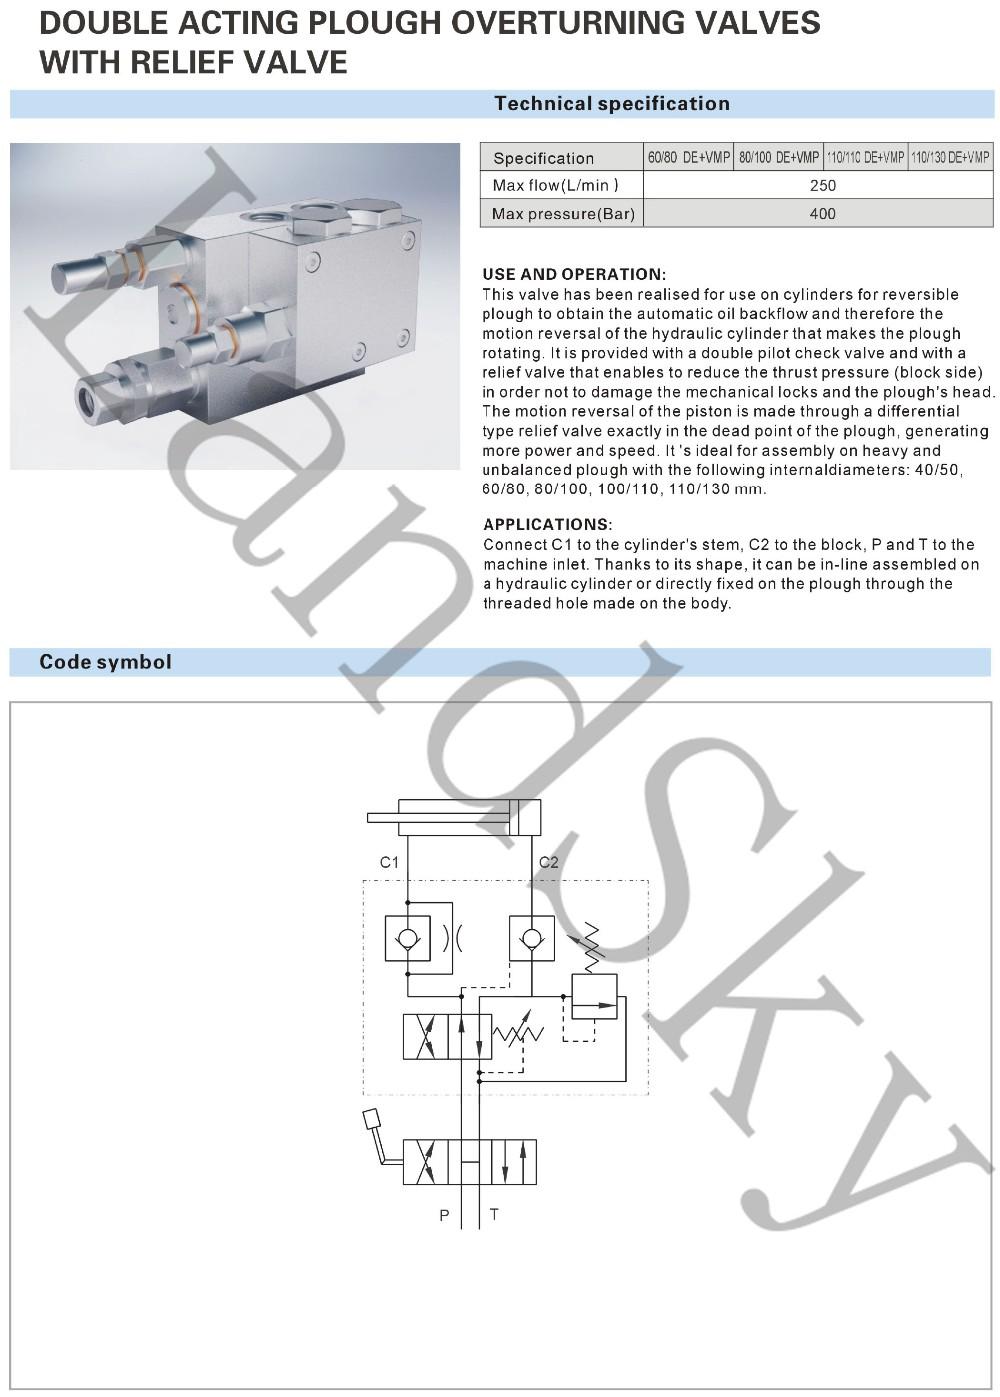 medium resolution of landsky rap 100 110 de vmp g3 8 hydraulic external double acting plough